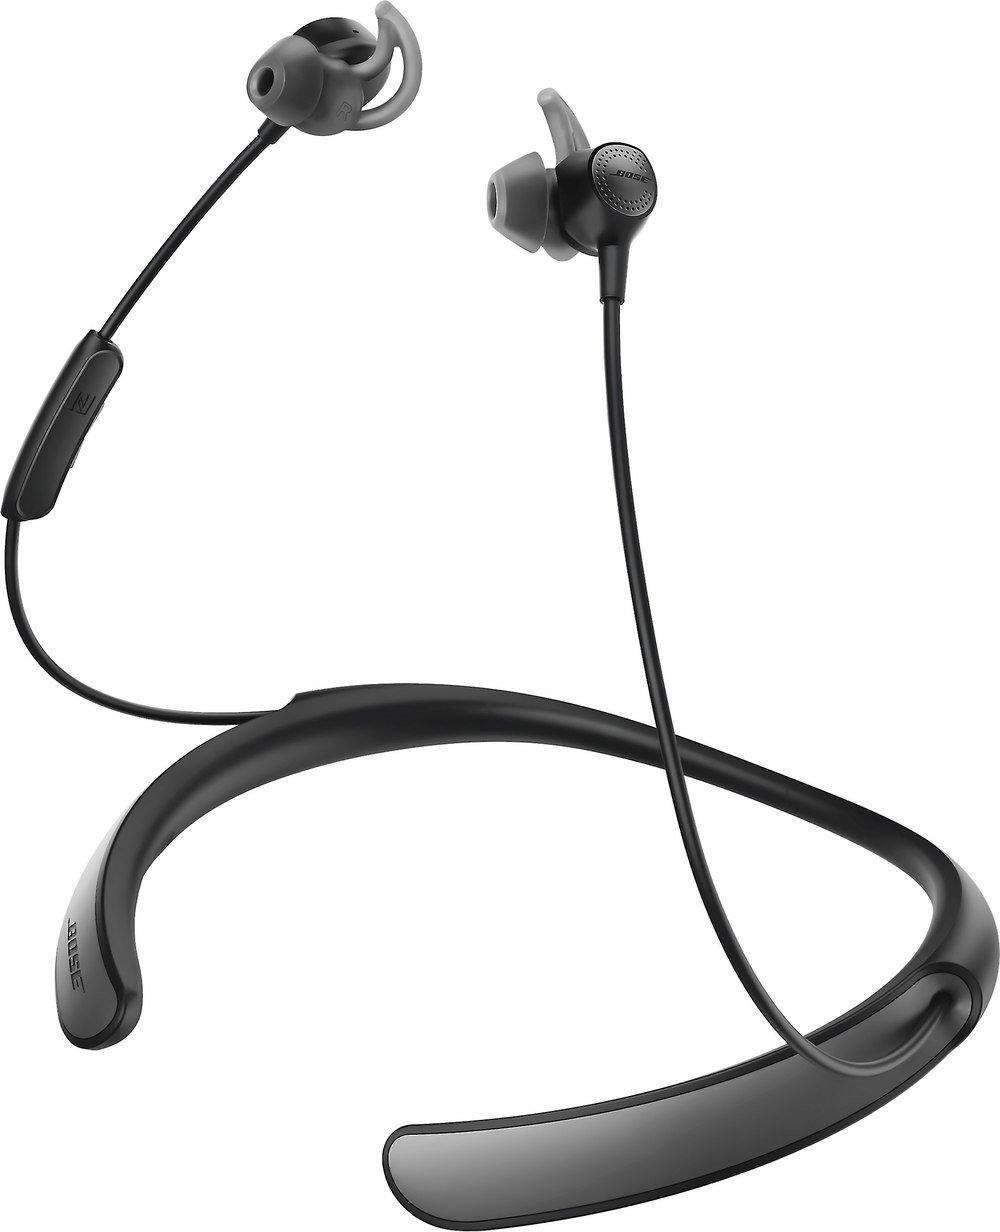 bose earphones. bose® quietcontrol® 30 wireless noise-cancelling headphones (black) at crutchfield canada bose earphones r